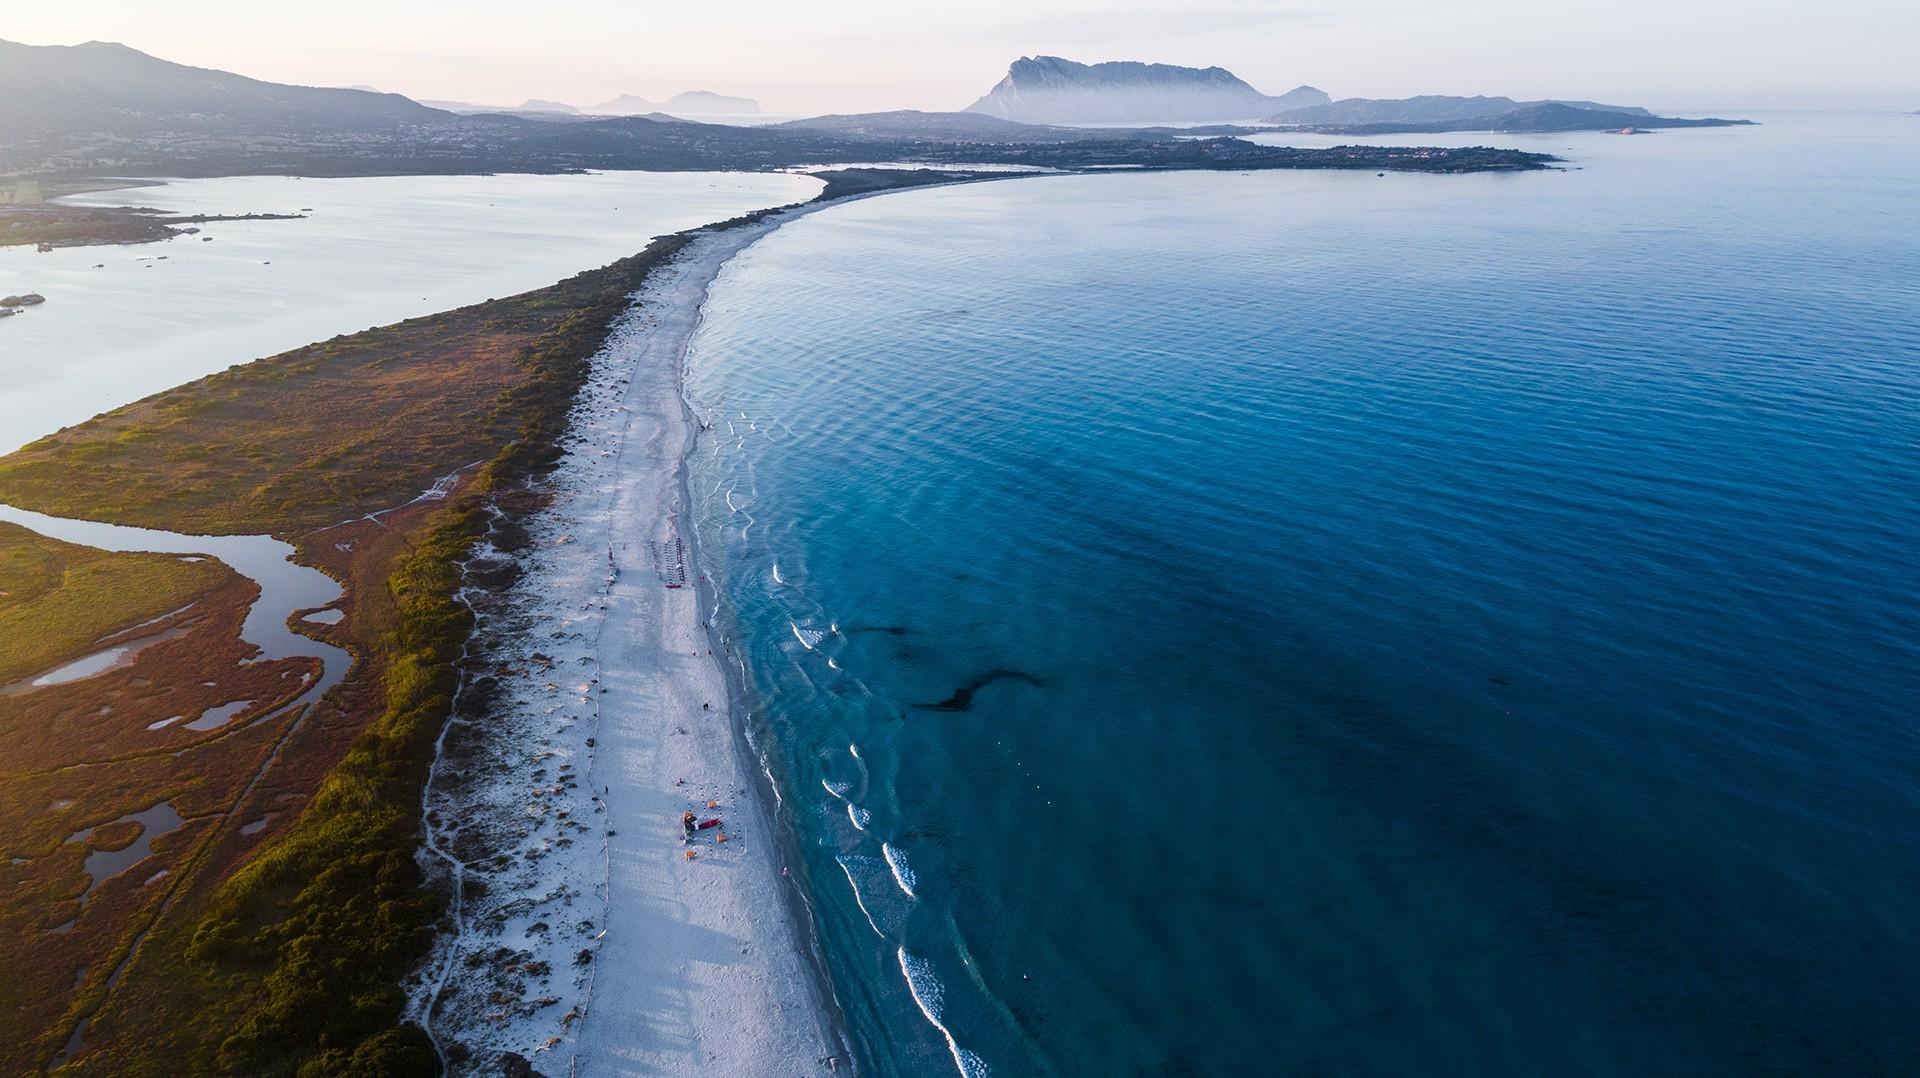 La Cinta - San Teodoro Sardinia Sardinia Aerial Photography drone Enrico Pescantini